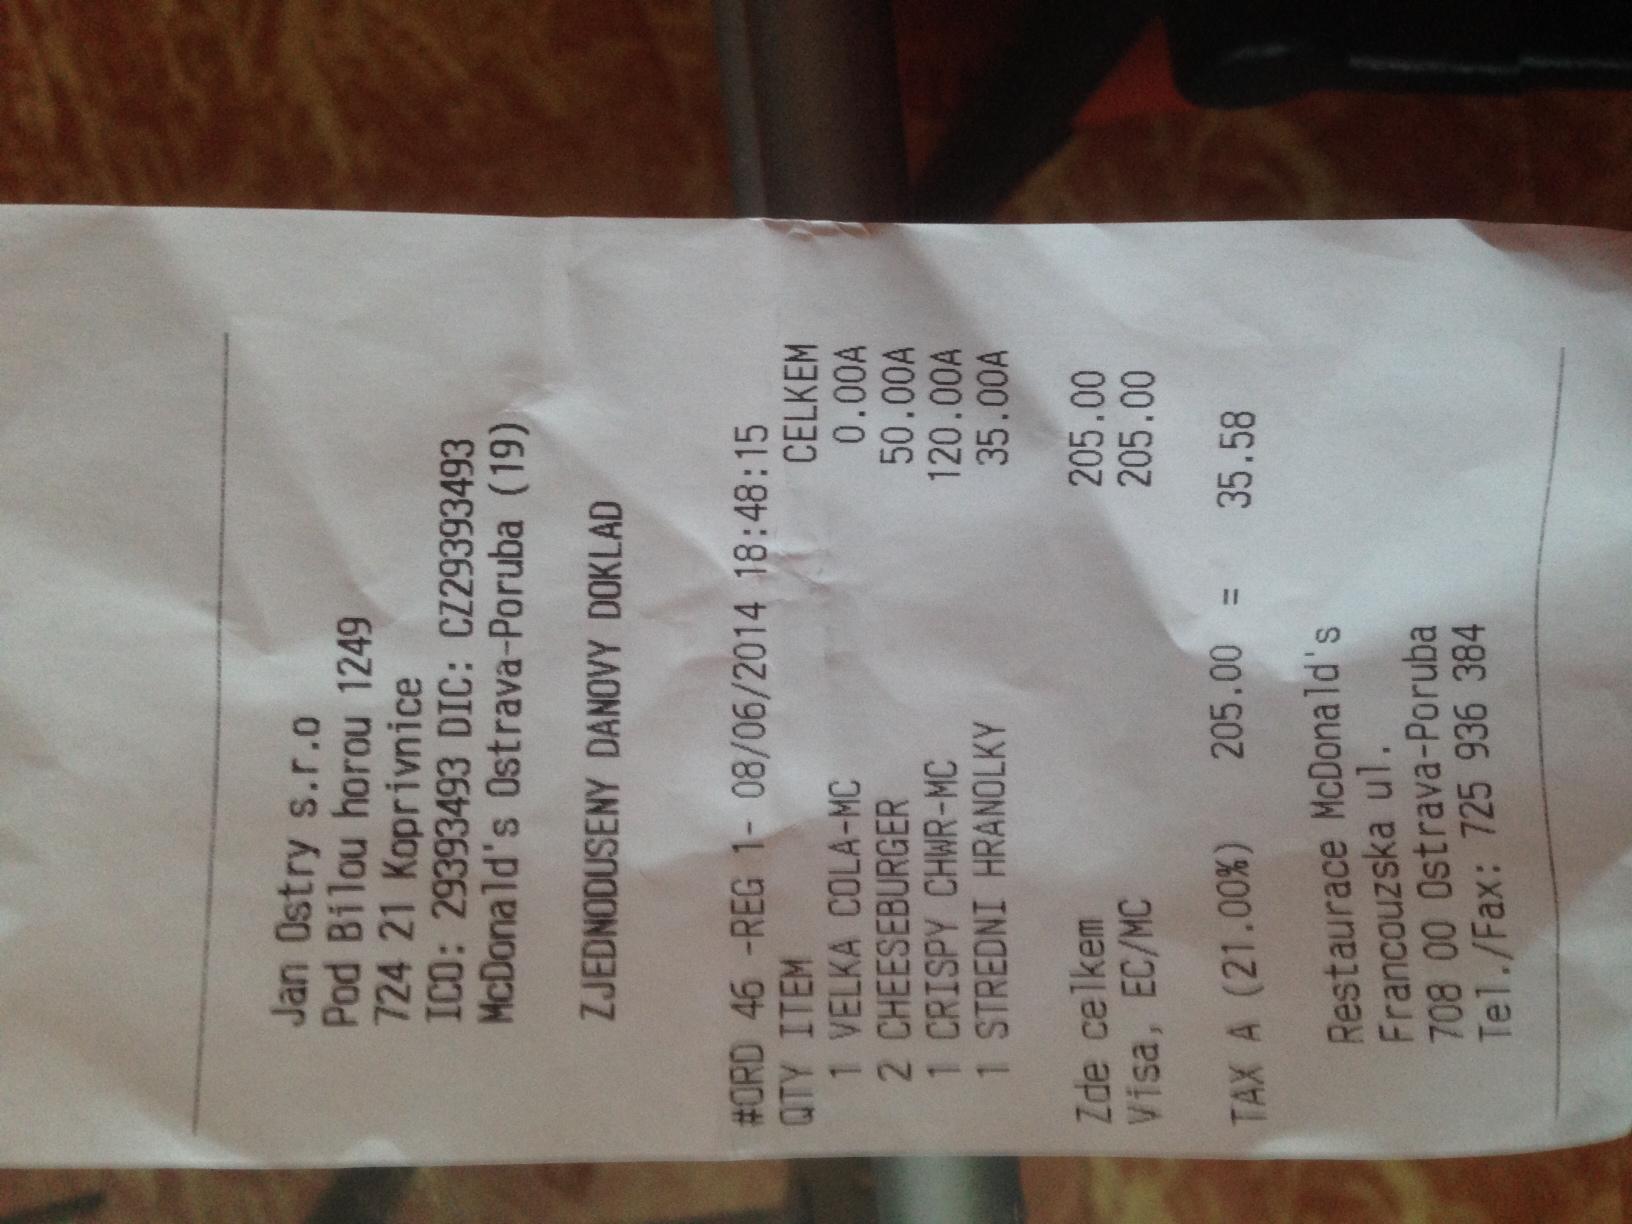 Kfc A Burger King Kradou Spolecne Maji Stejneho Provozovatele